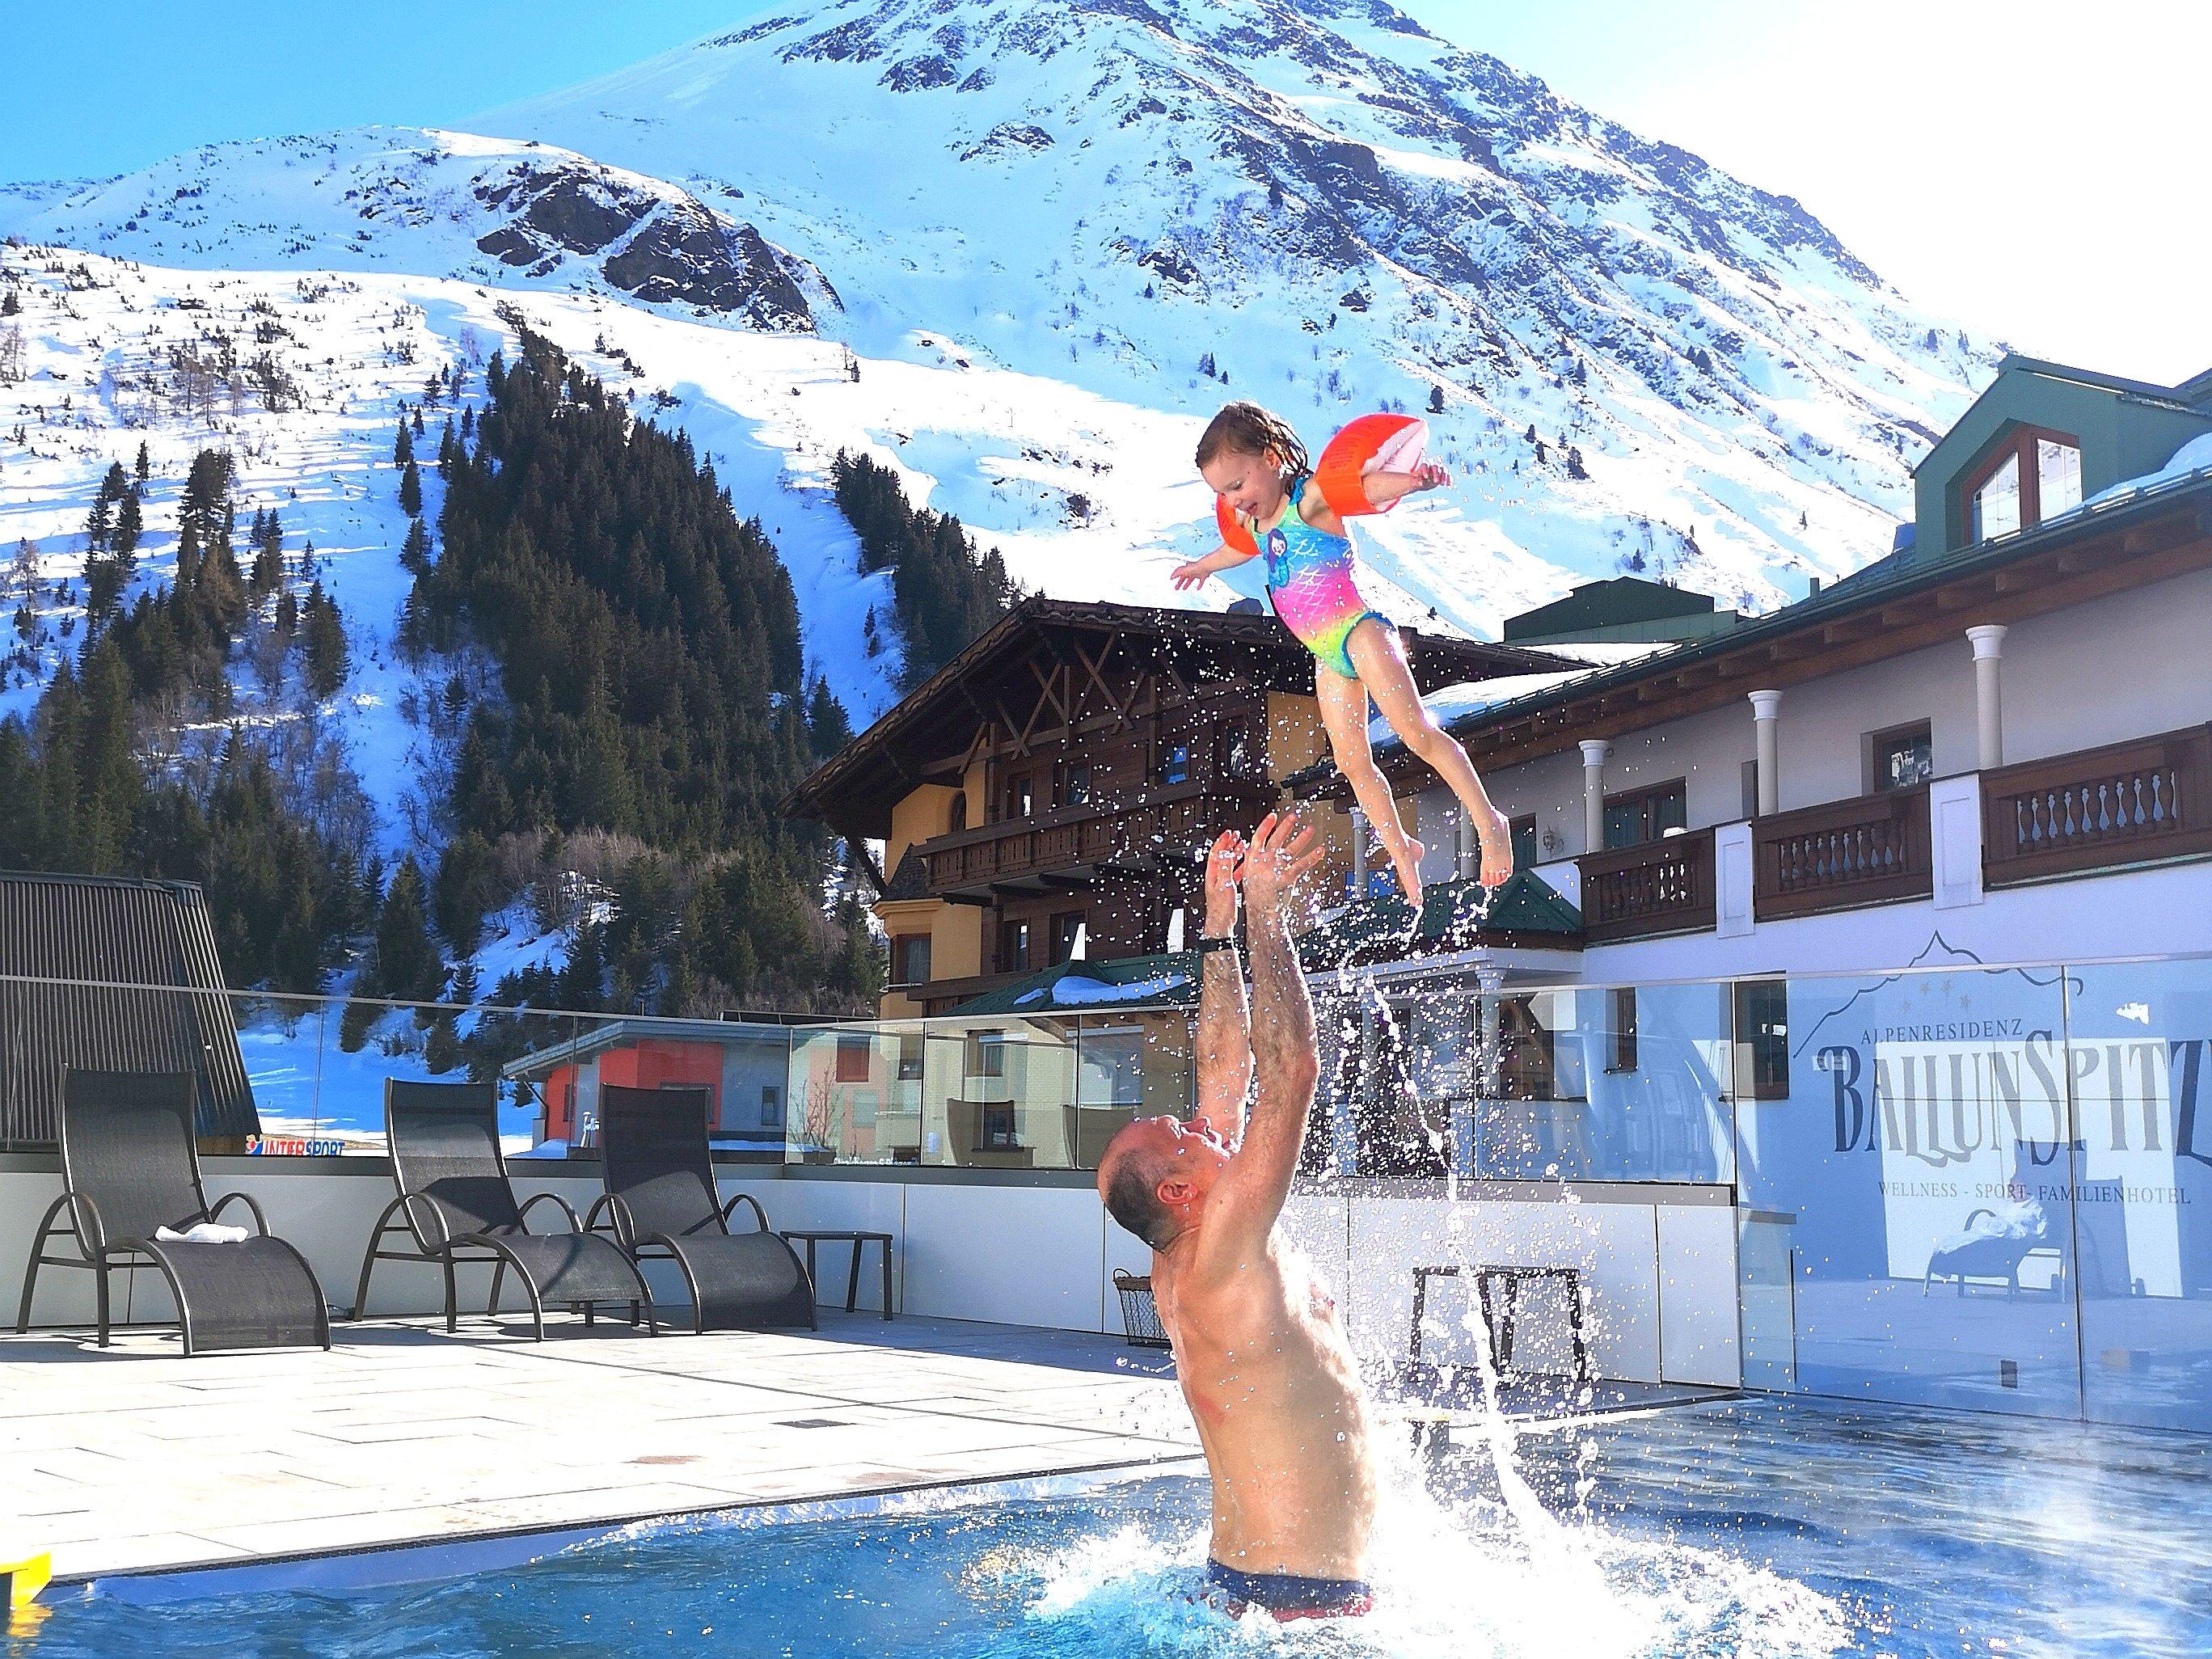 Urlaub in einem Kinderhotel – Alpenresidenz Ballunspitze